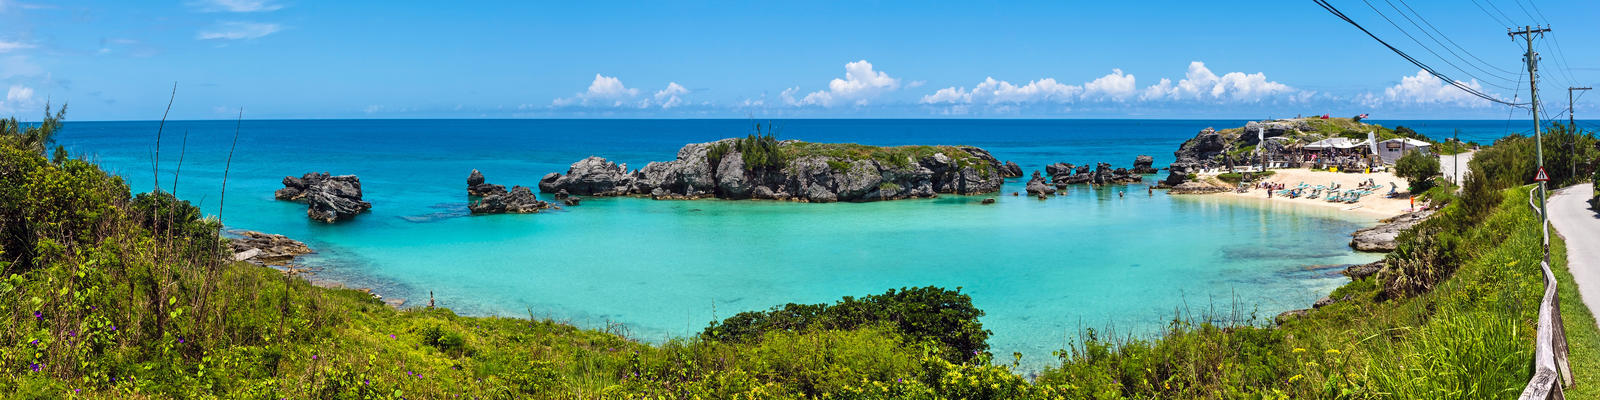 Tobacco Bay near St George's in Bermuda (Photo: Andrew F. Kazmierski/Shutterstock)